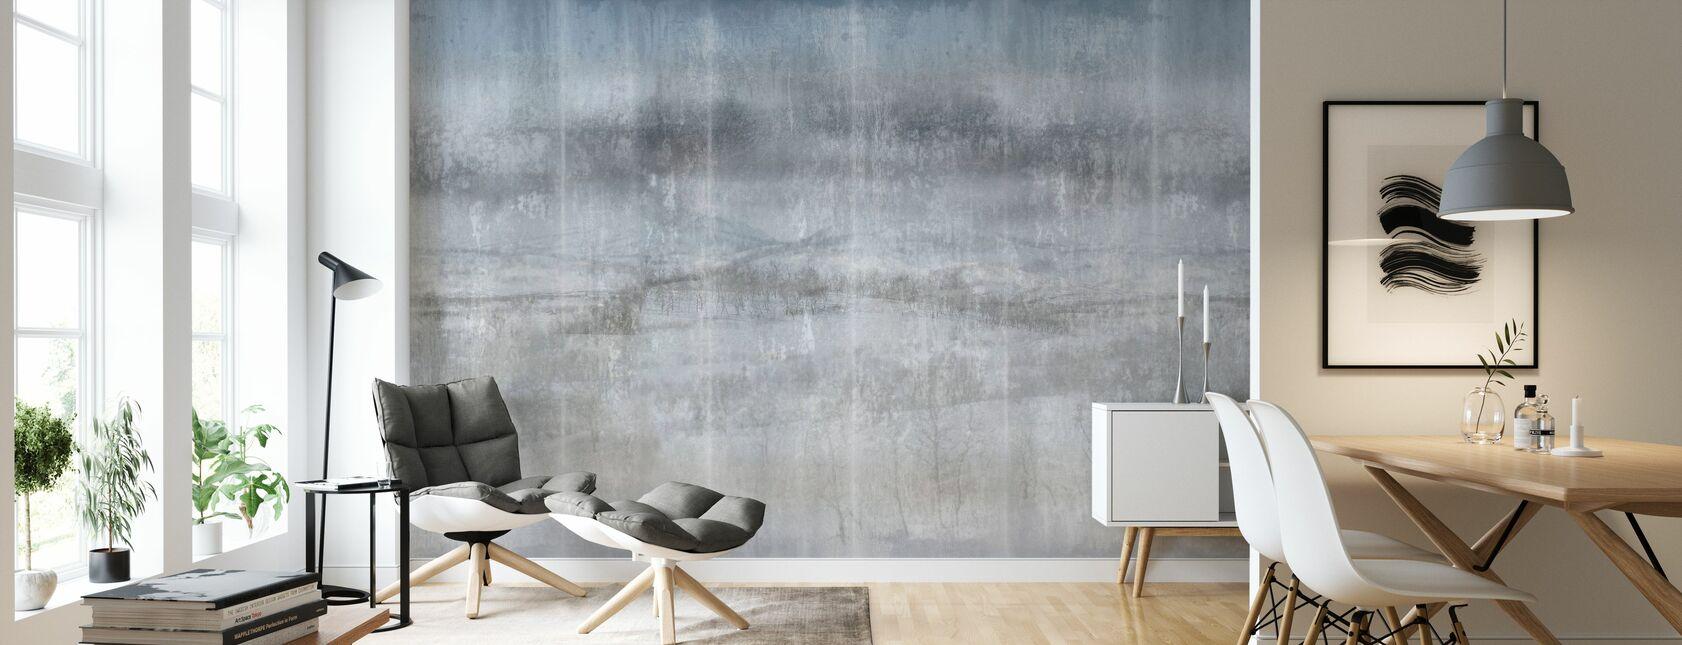 Lost Landscape - Light - Wallpaper - Living Room